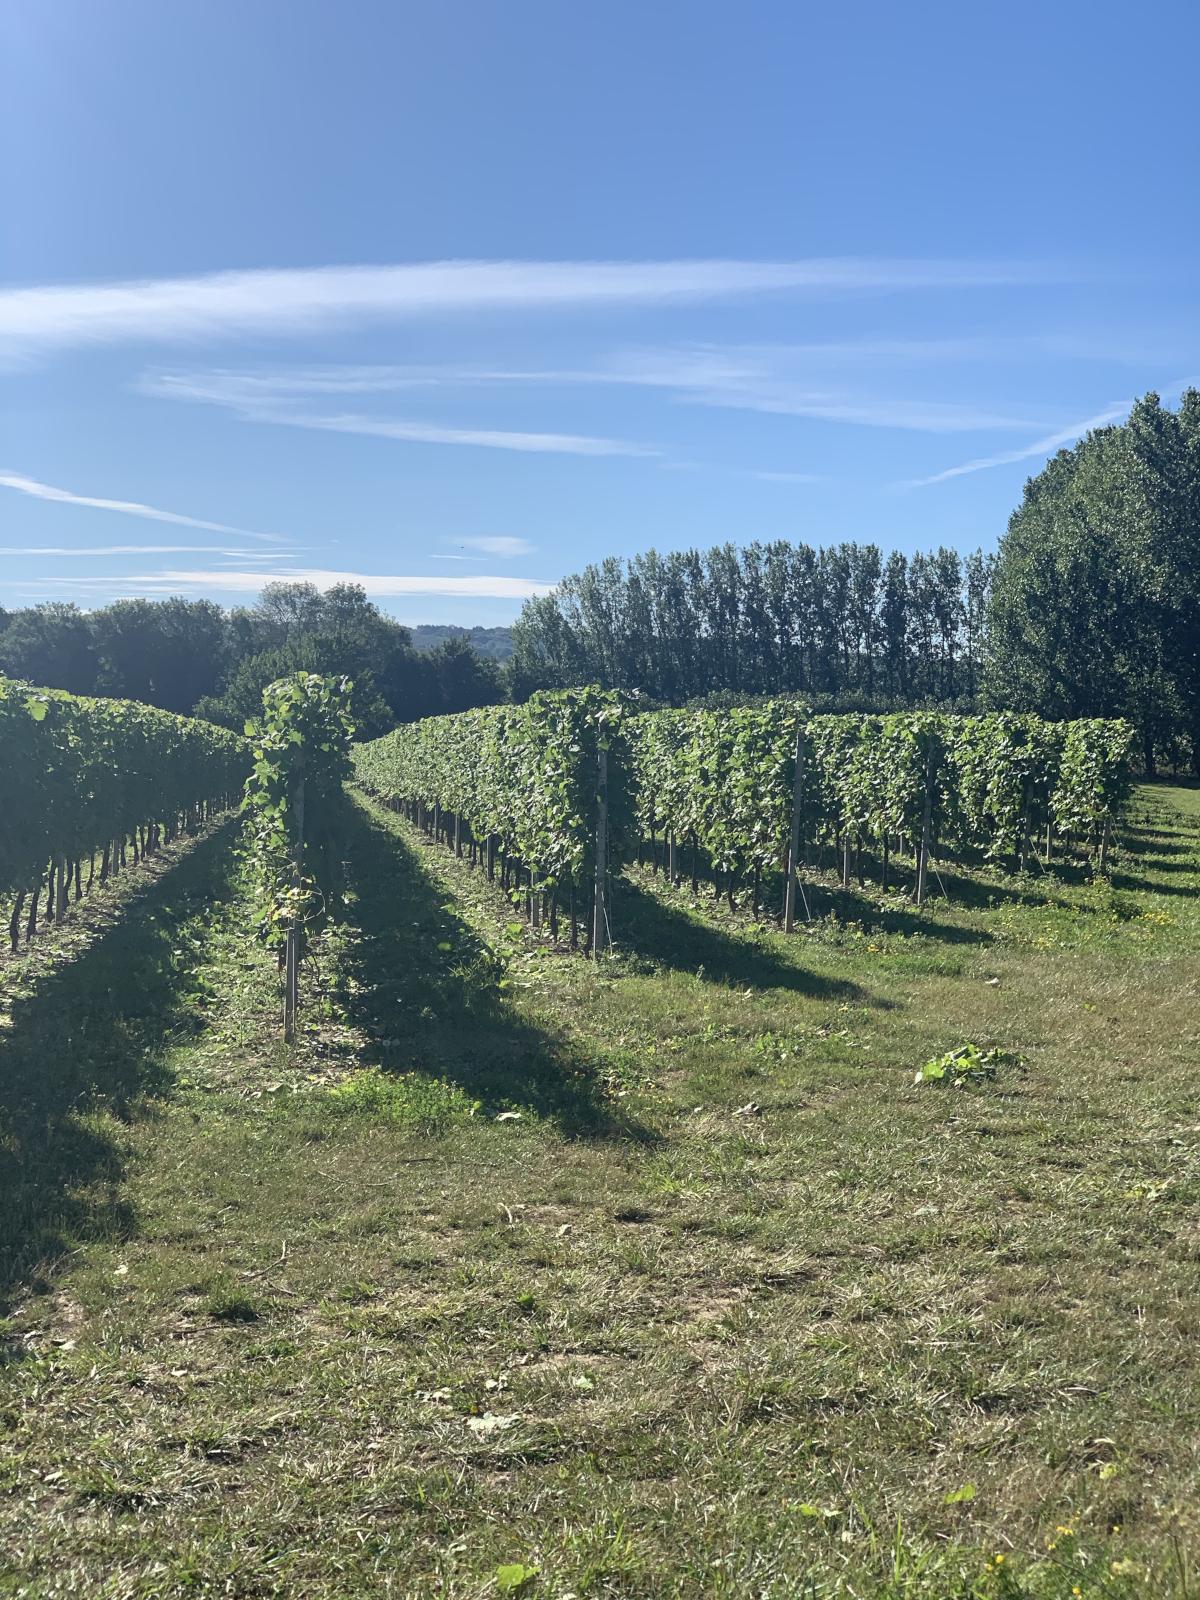 The vineyard at Brenley Farm near the Bombus Studio, Faversham